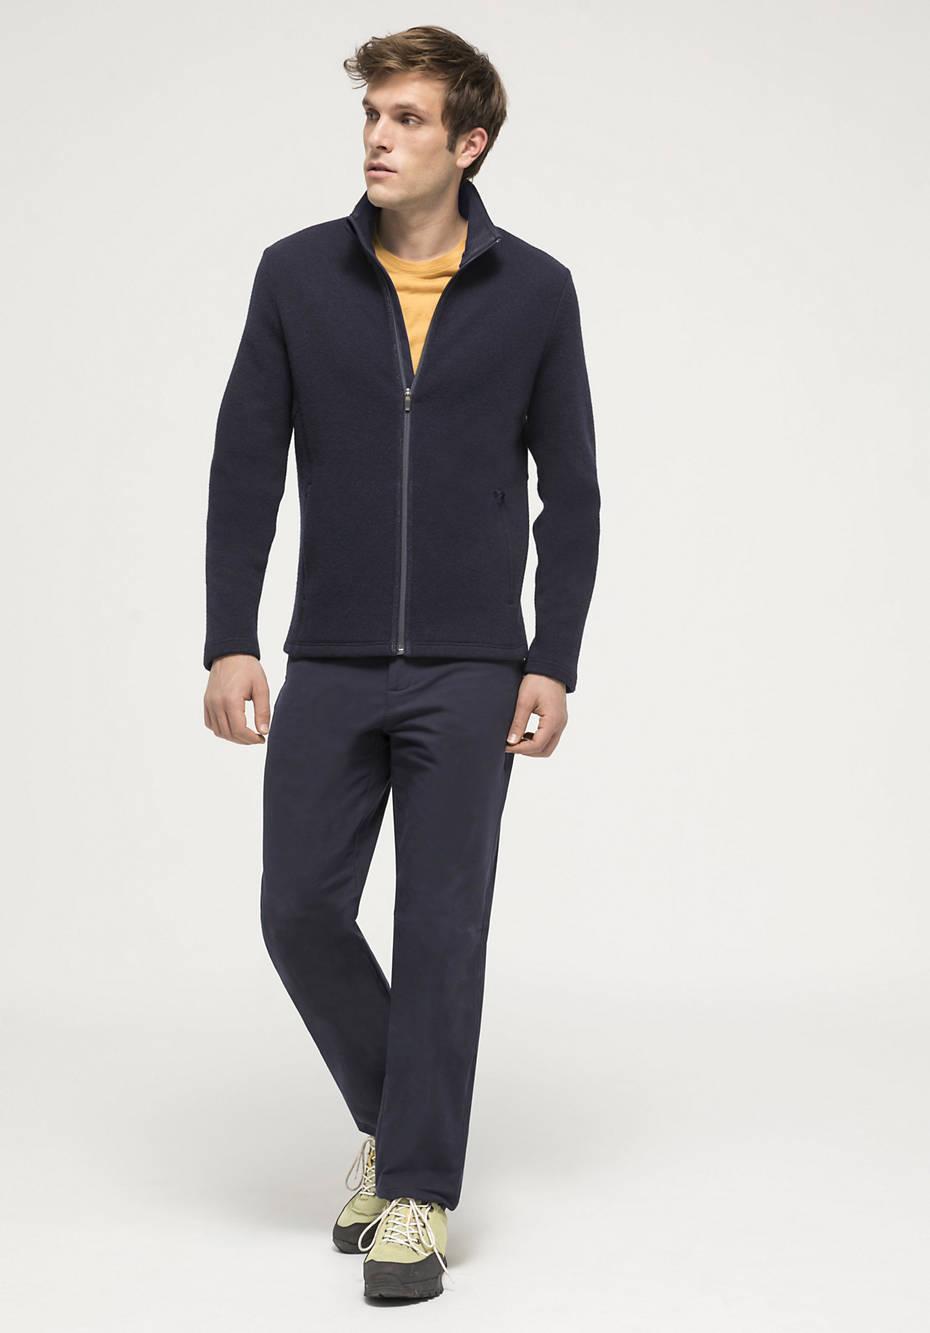 Mesh fleece jacket made of organic merino wool with organic cotton